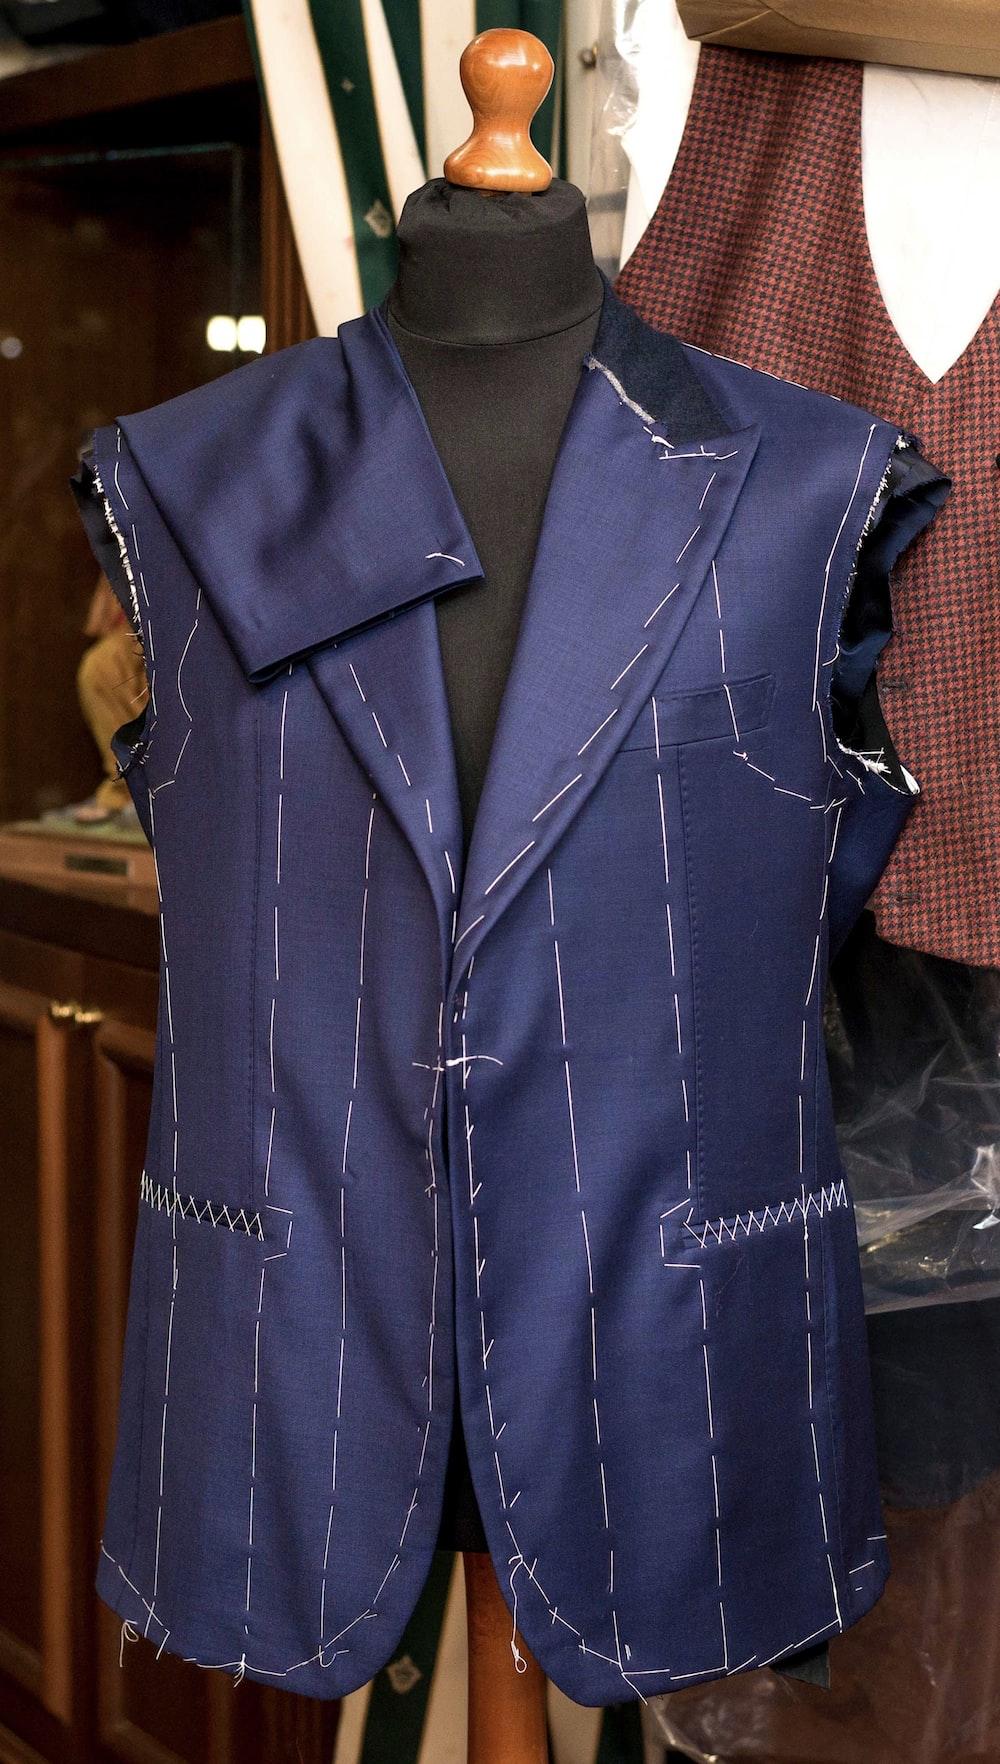 black button up long sleeve shirt